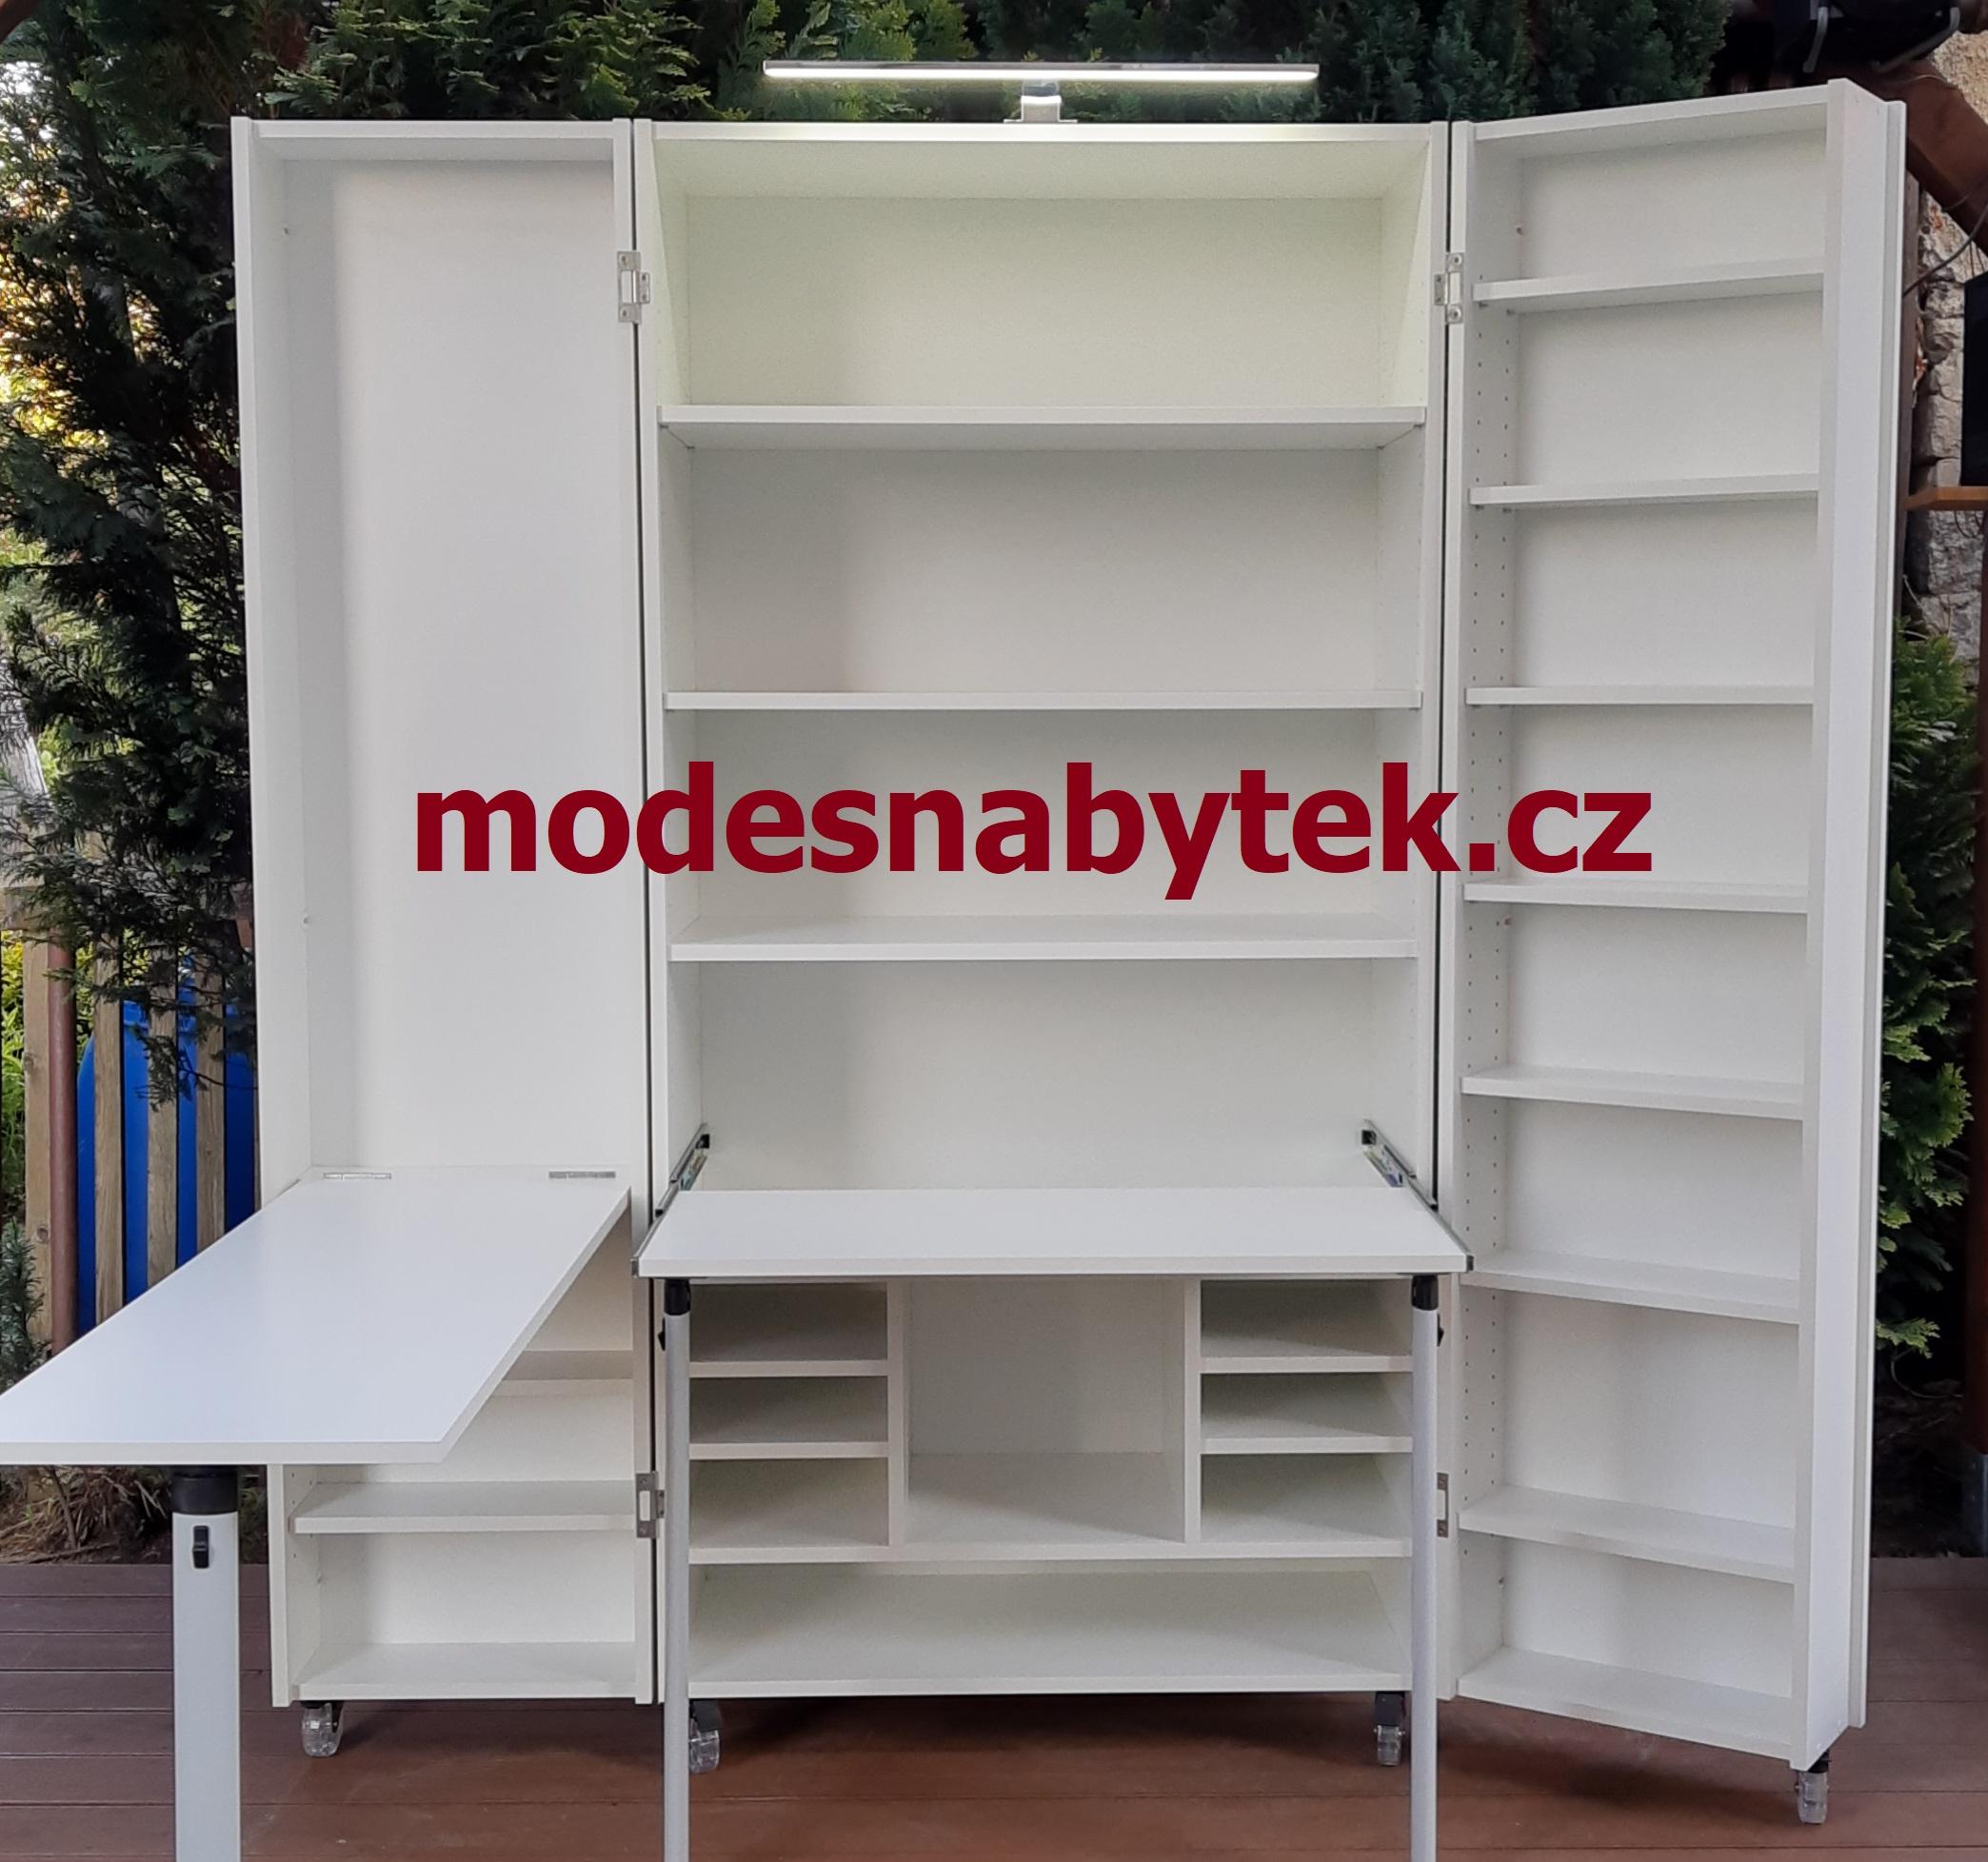 hobbybox  pro švadlenky